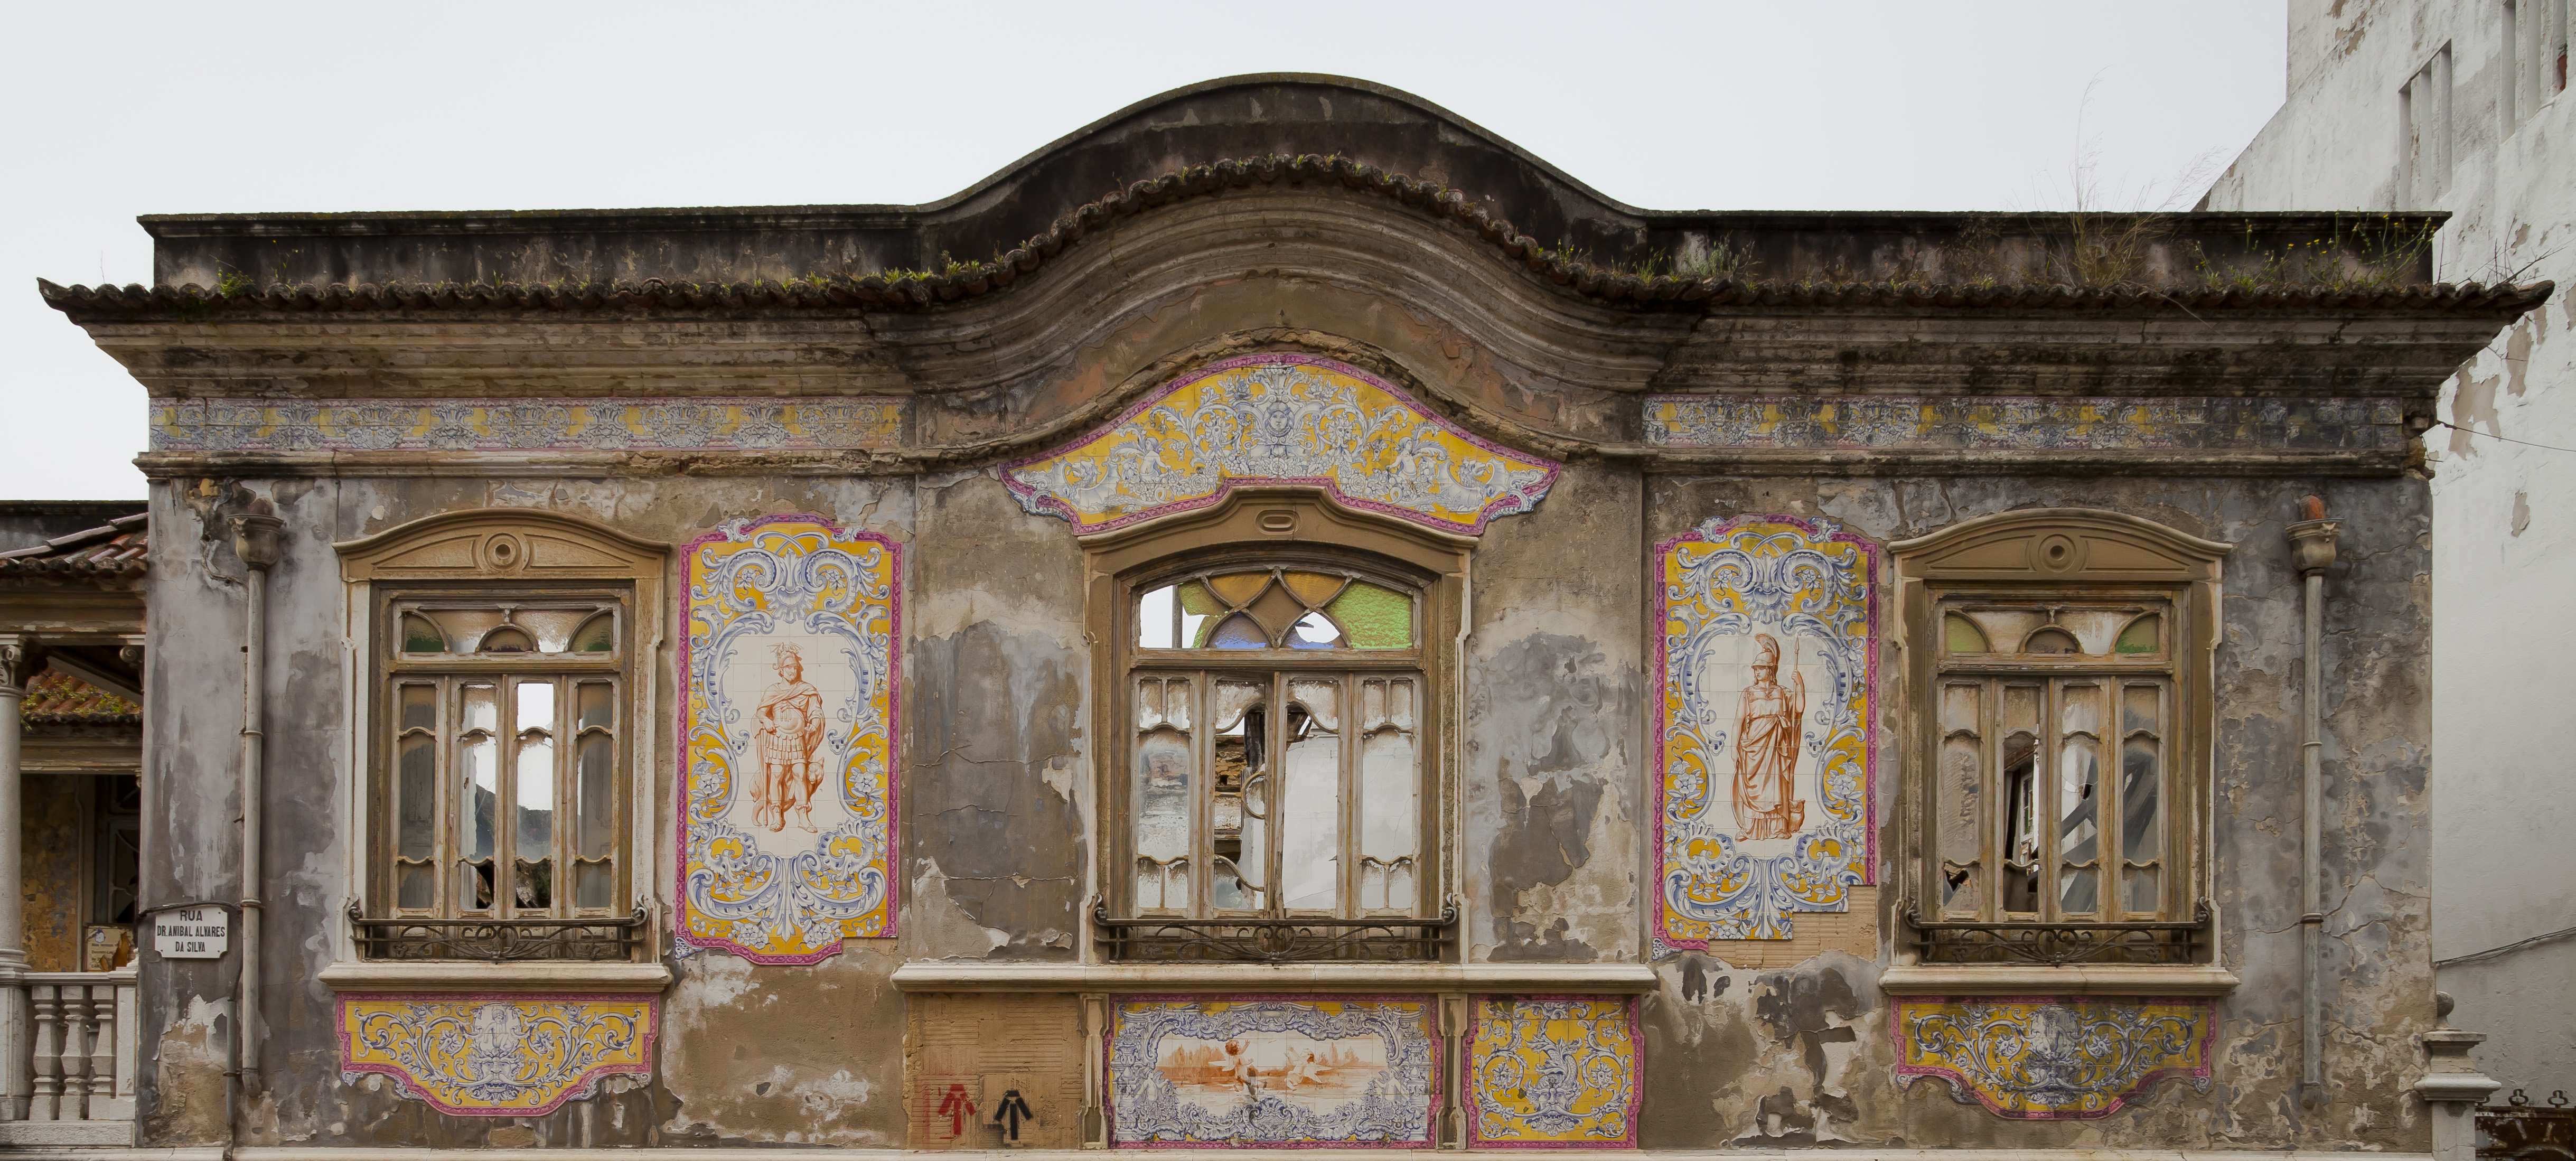 Edificio abandonado en Setúbal (Portugal)